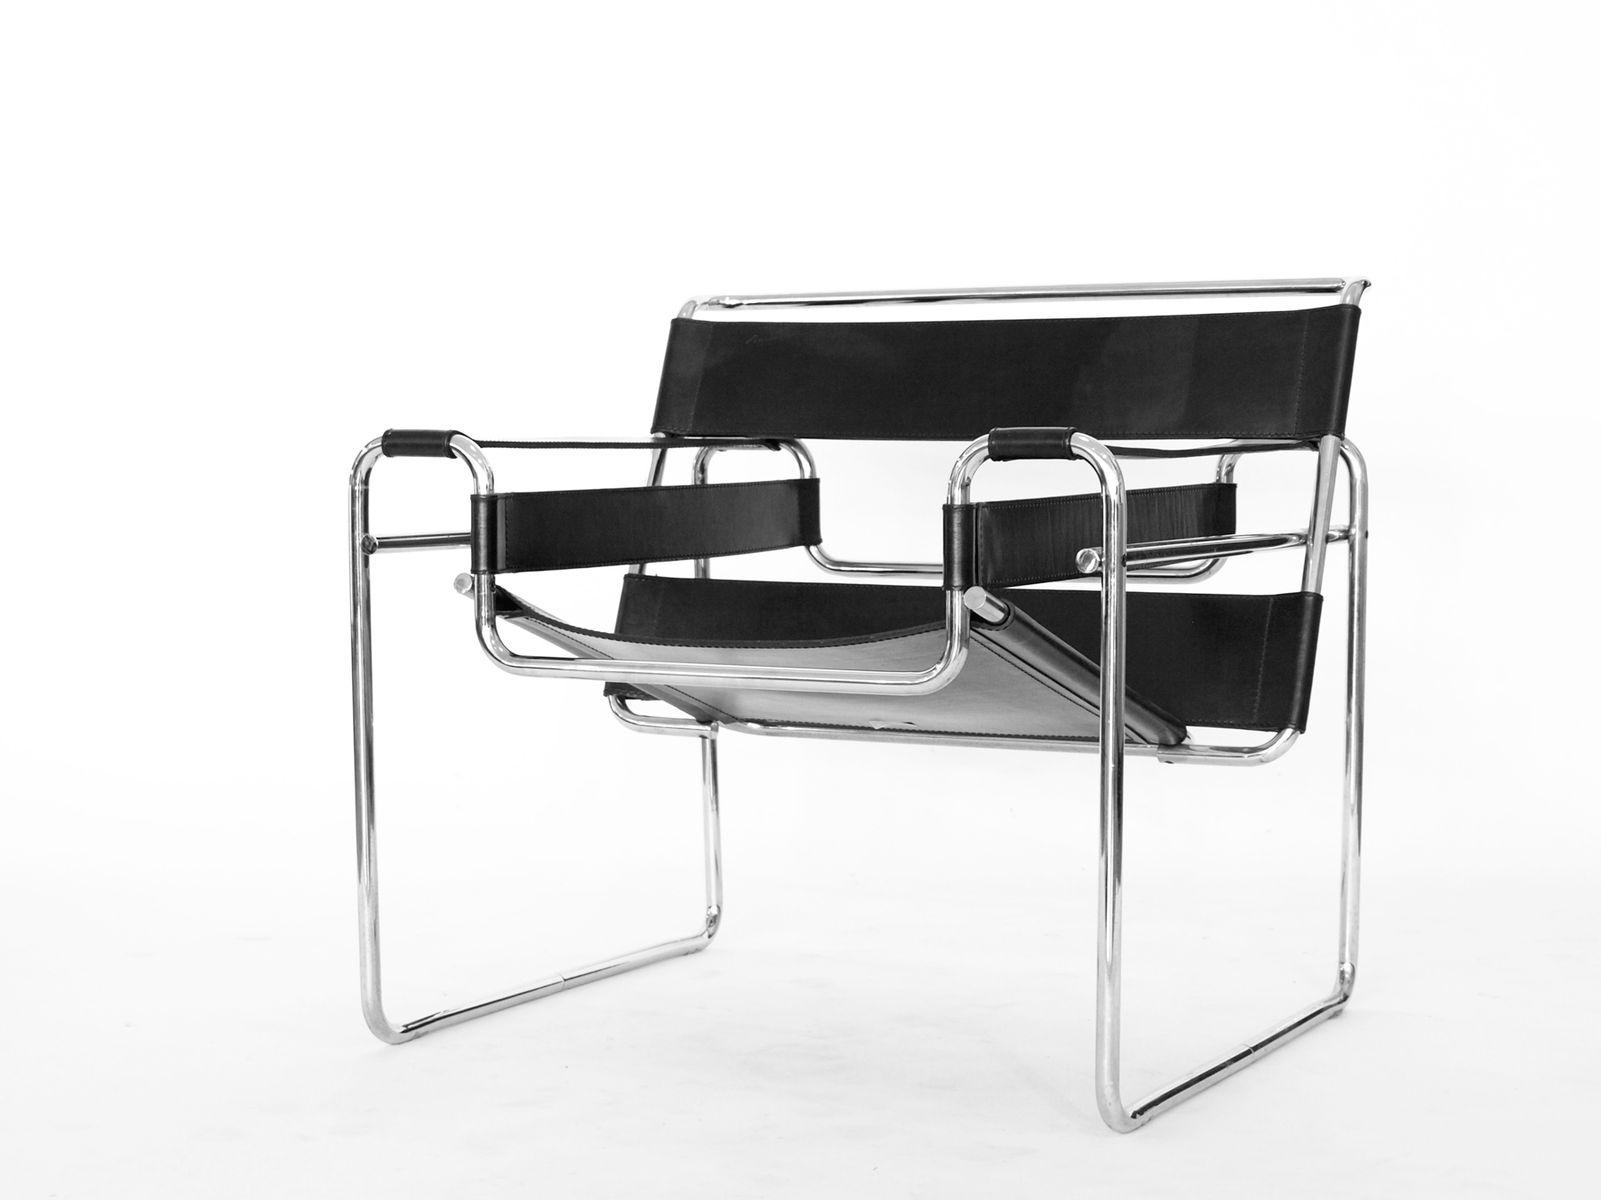 wassily chair von marcel breuer f r gavina 1960er. Black Bedroom Furniture Sets. Home Design Ideas